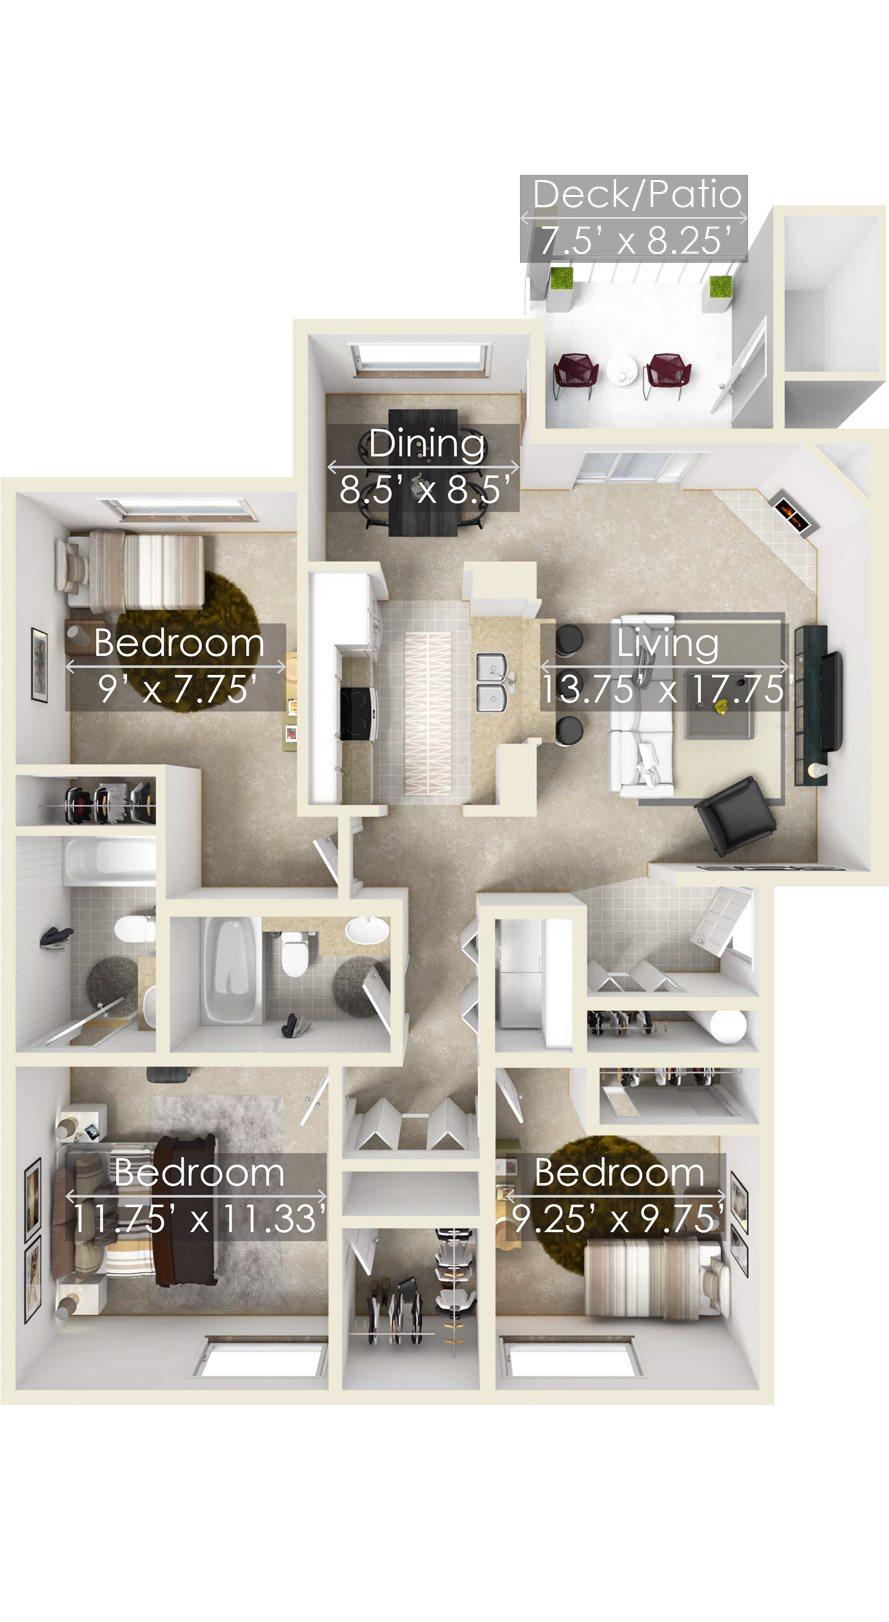 The Chinook Two Bedroom Floorplan